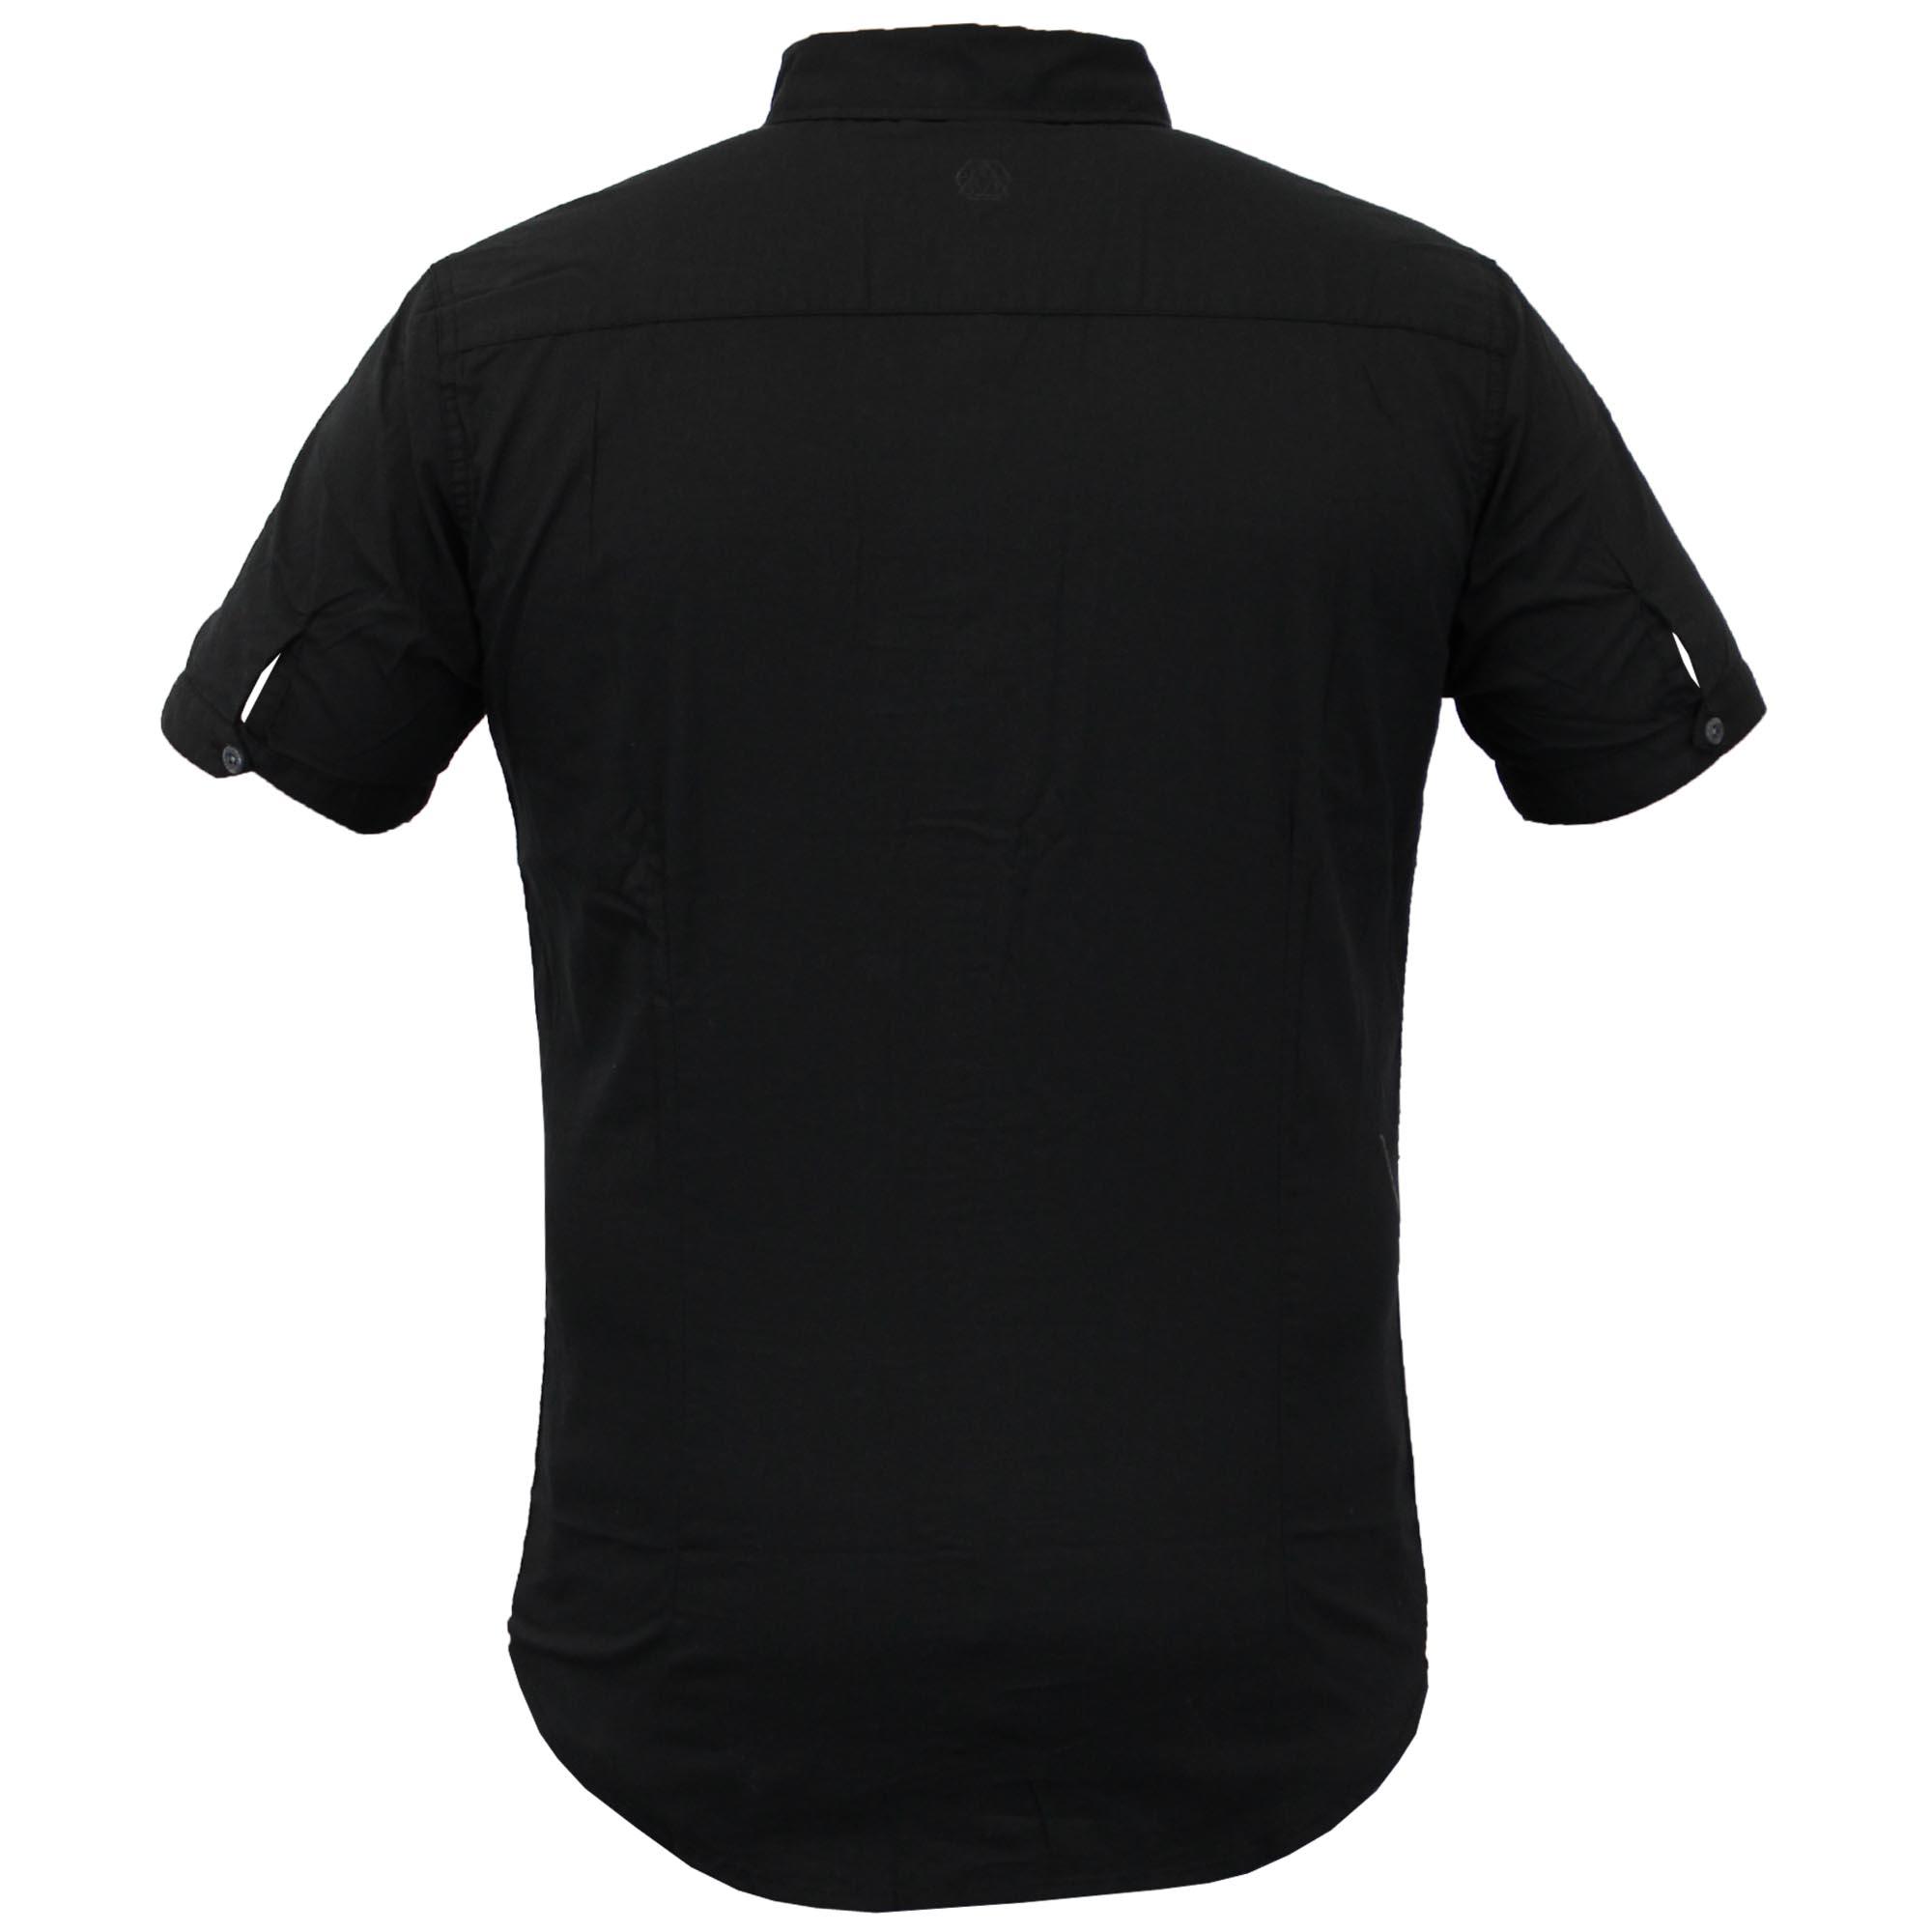 Camisas-de-vestir-para-hombre-de-alma-valiente-Smith-amp-Jones-Manga-Corta-Larga-De-Algodon-Con miniatura 6